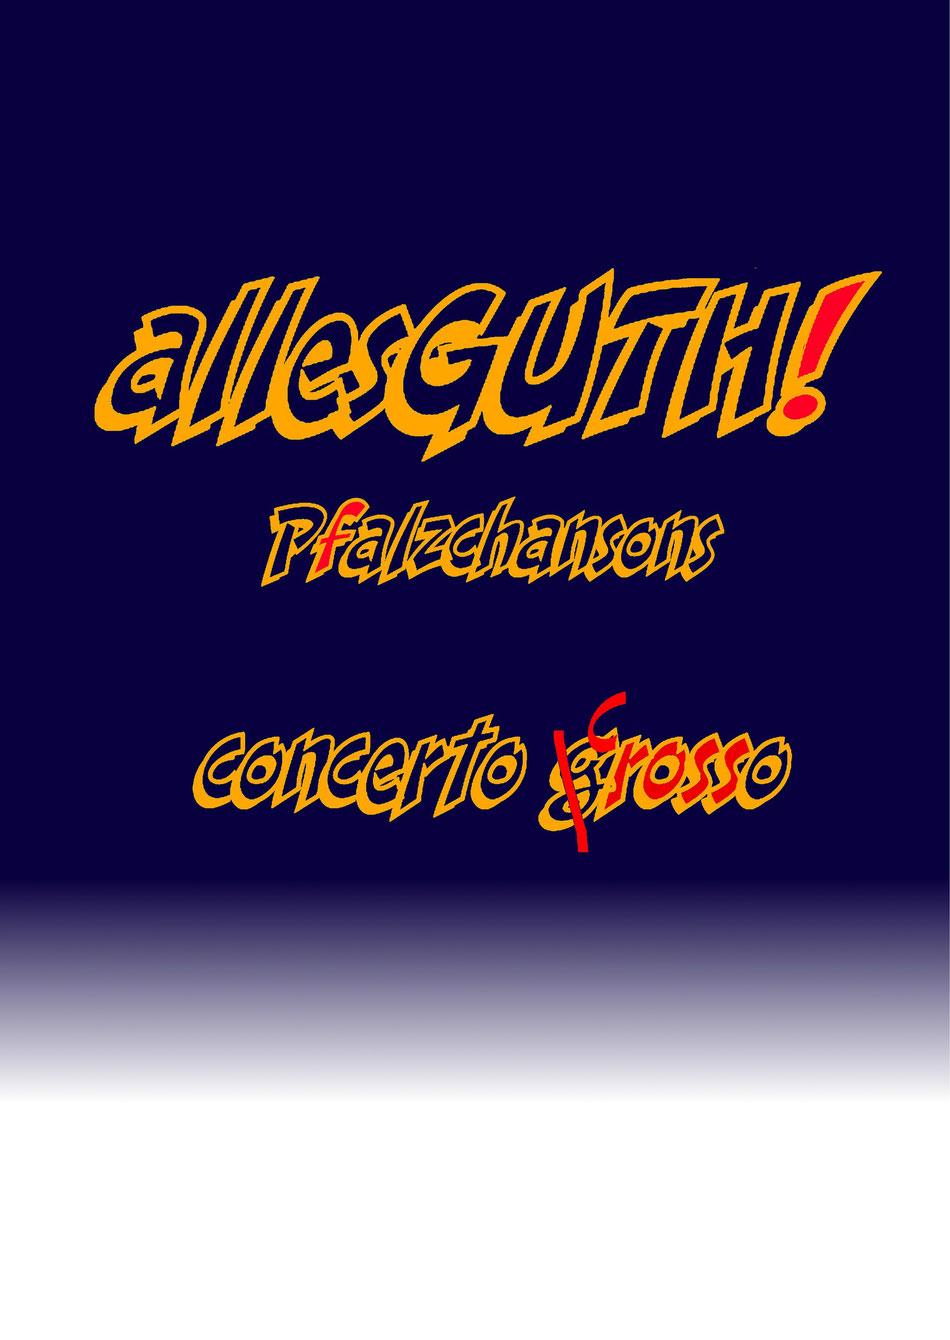 allesGUTH - Gewidder Dunner Keil Nachfolgeband Hannah Guth, Manue T. Breiner, Alexander Lehmann, Rosi Flury